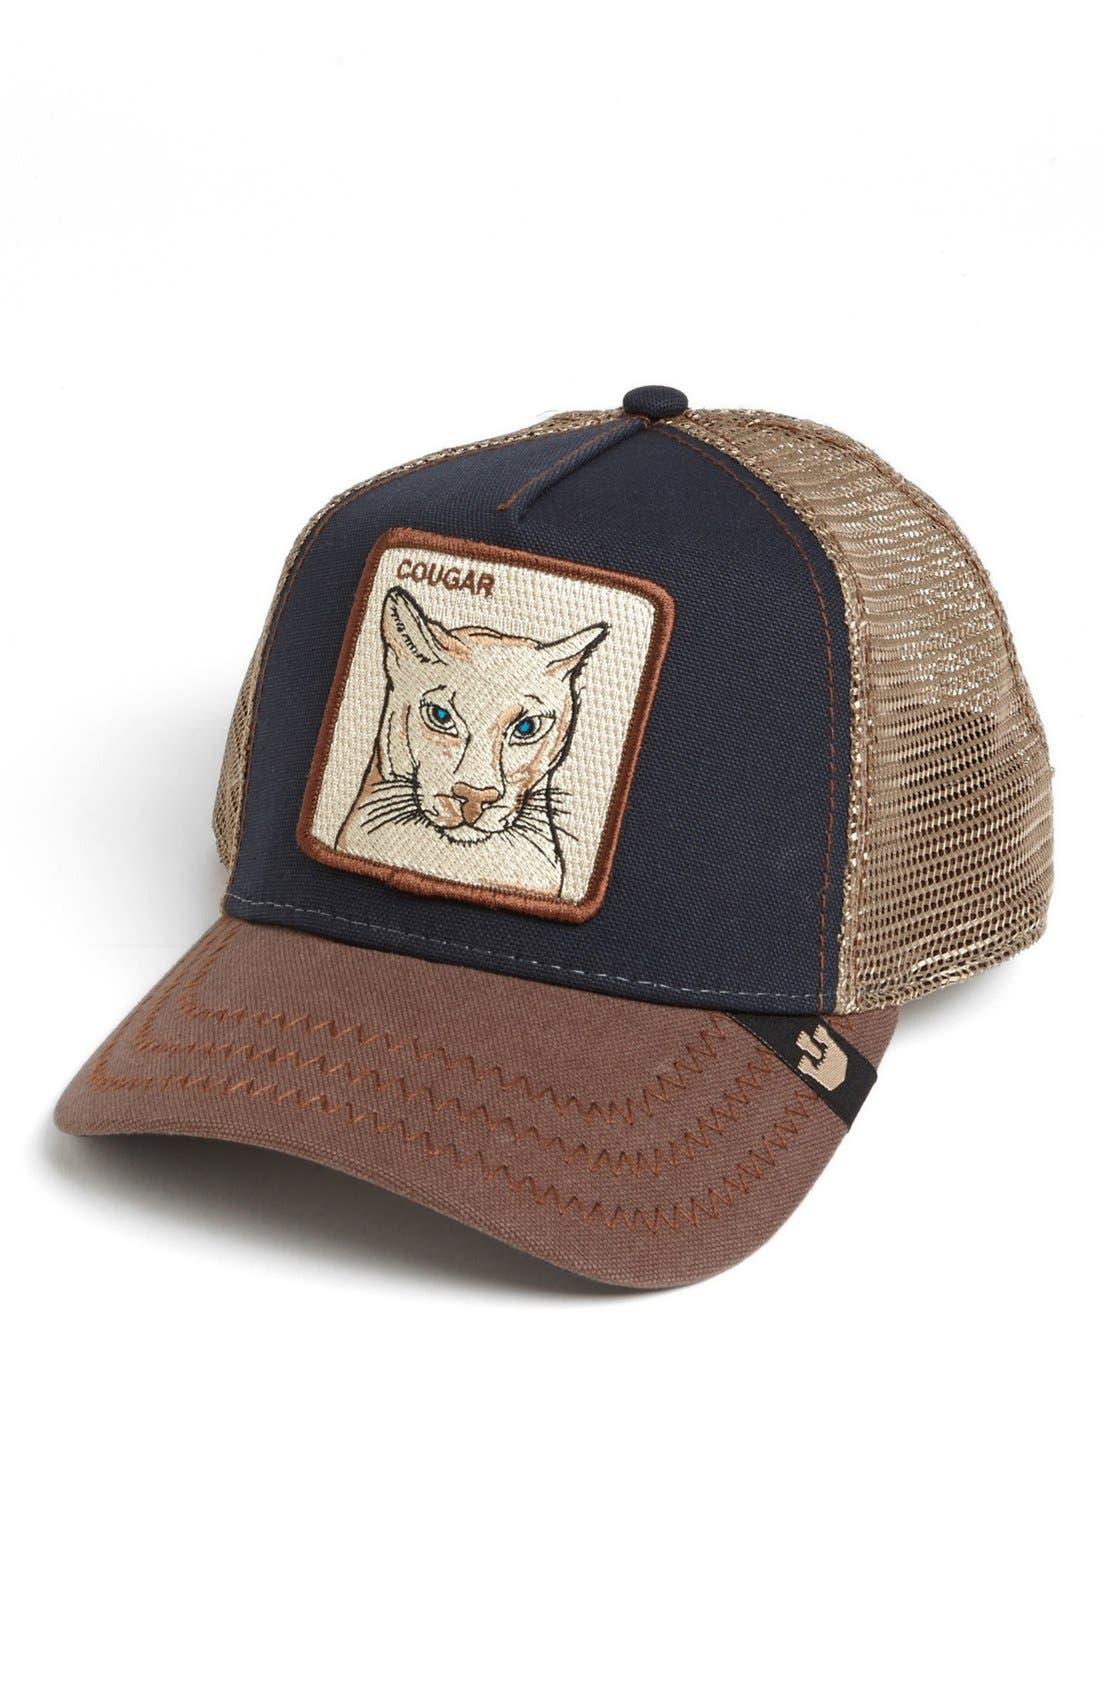 Main Image - Goorin Brothers 'Animal Farm - Cougar' Trucker Hat